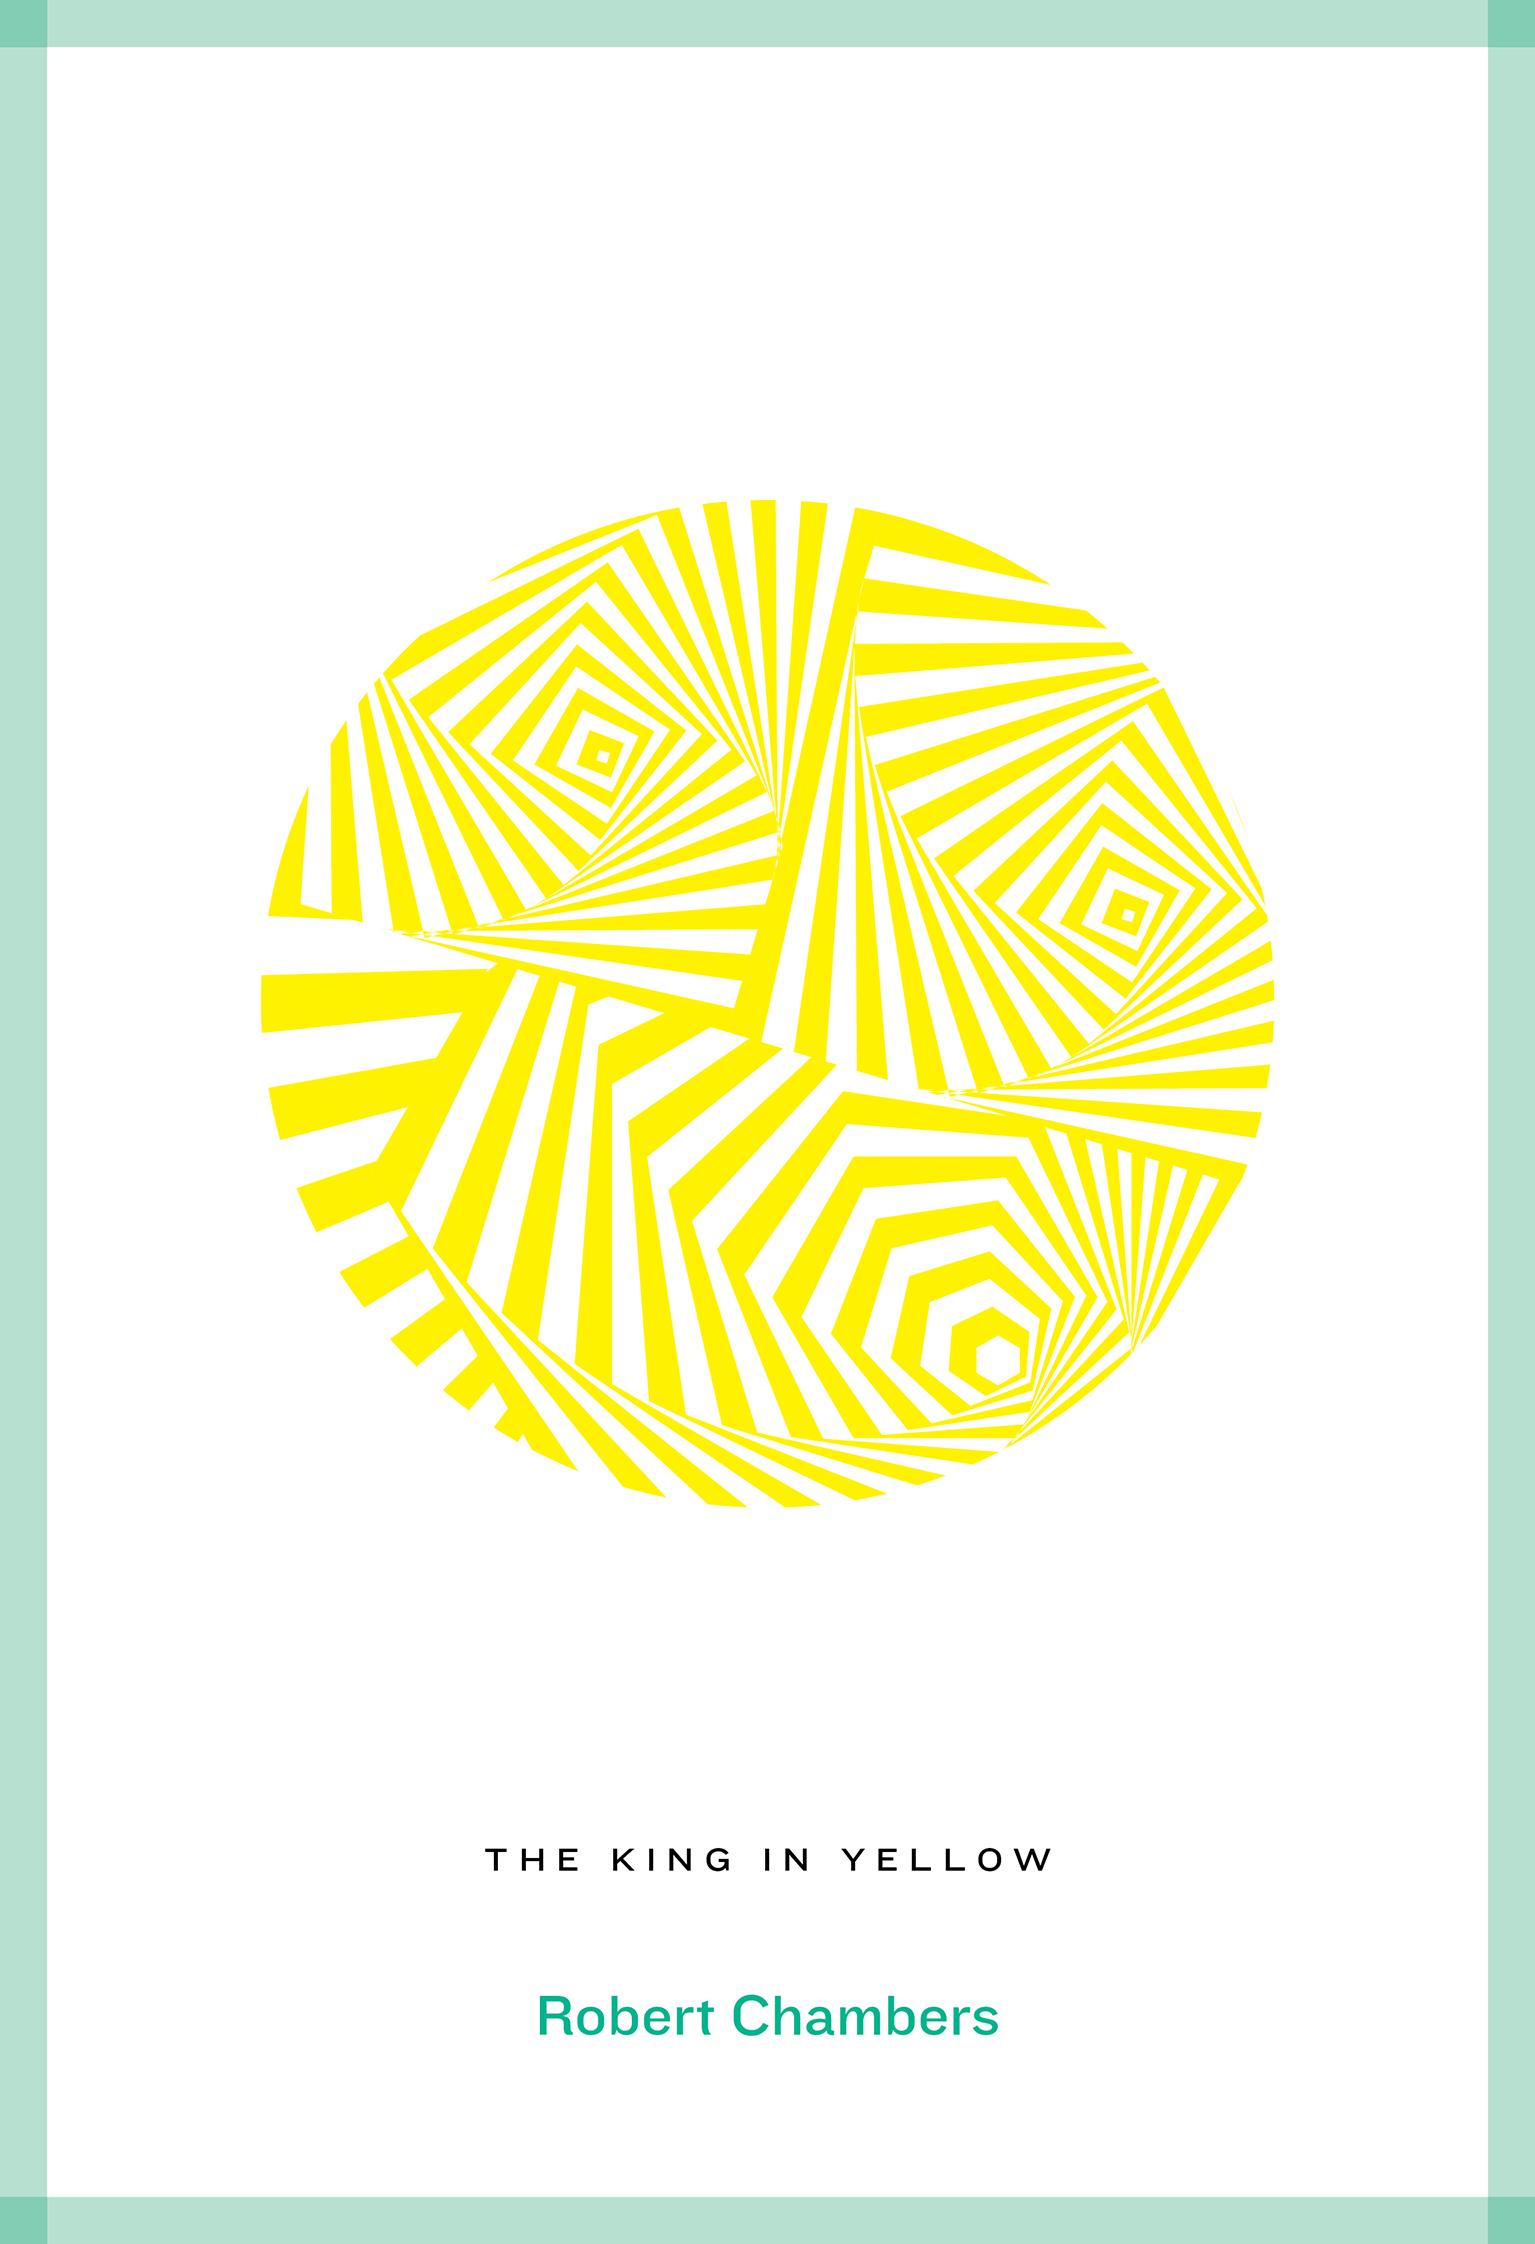 9781909399501 The King In Yellow.jpg